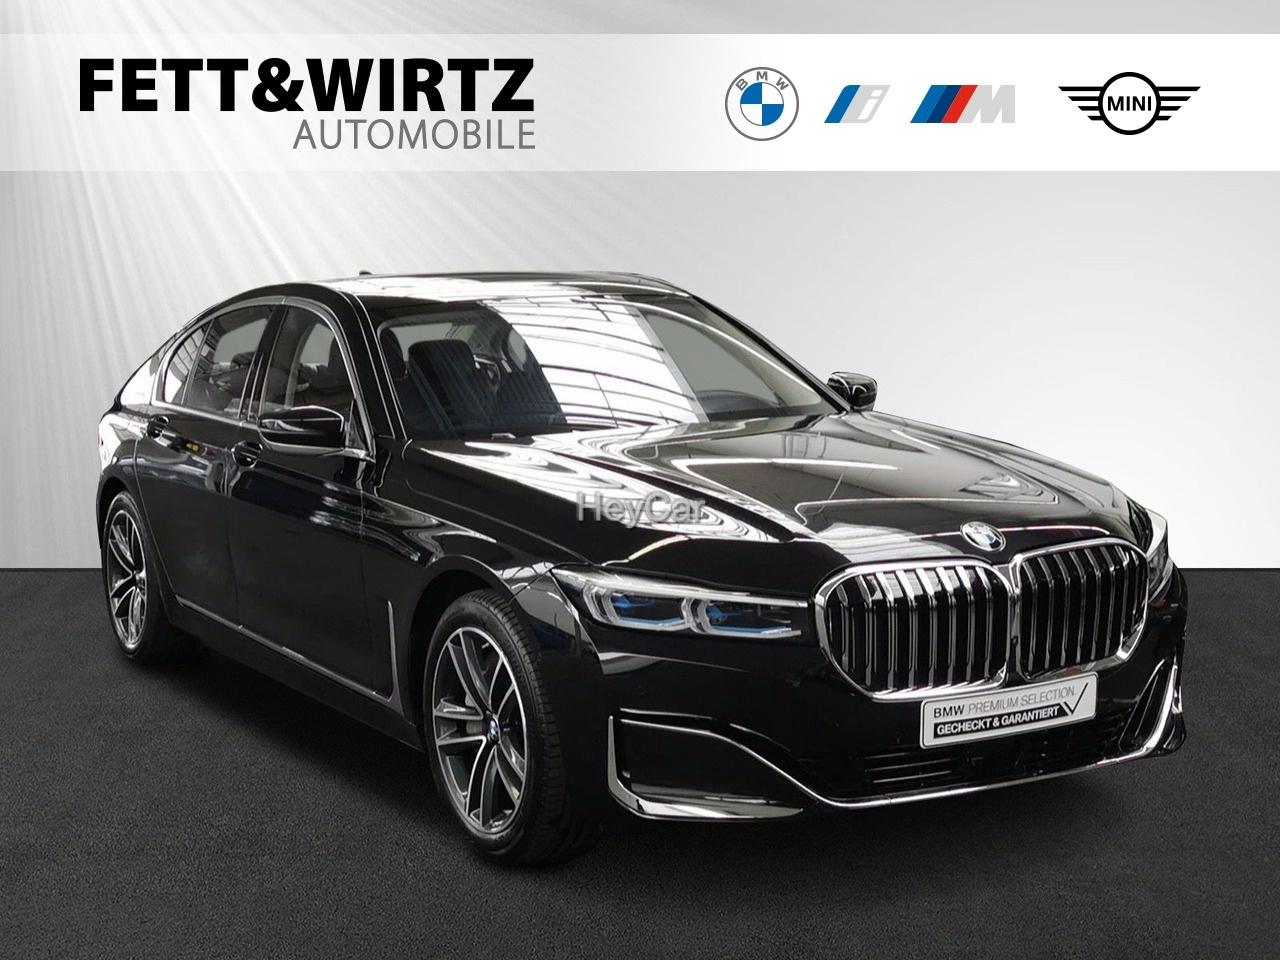 BMW 745e UPE 139.942,- Fond-Entertainment Experience, Jahr 2020, Hybrid